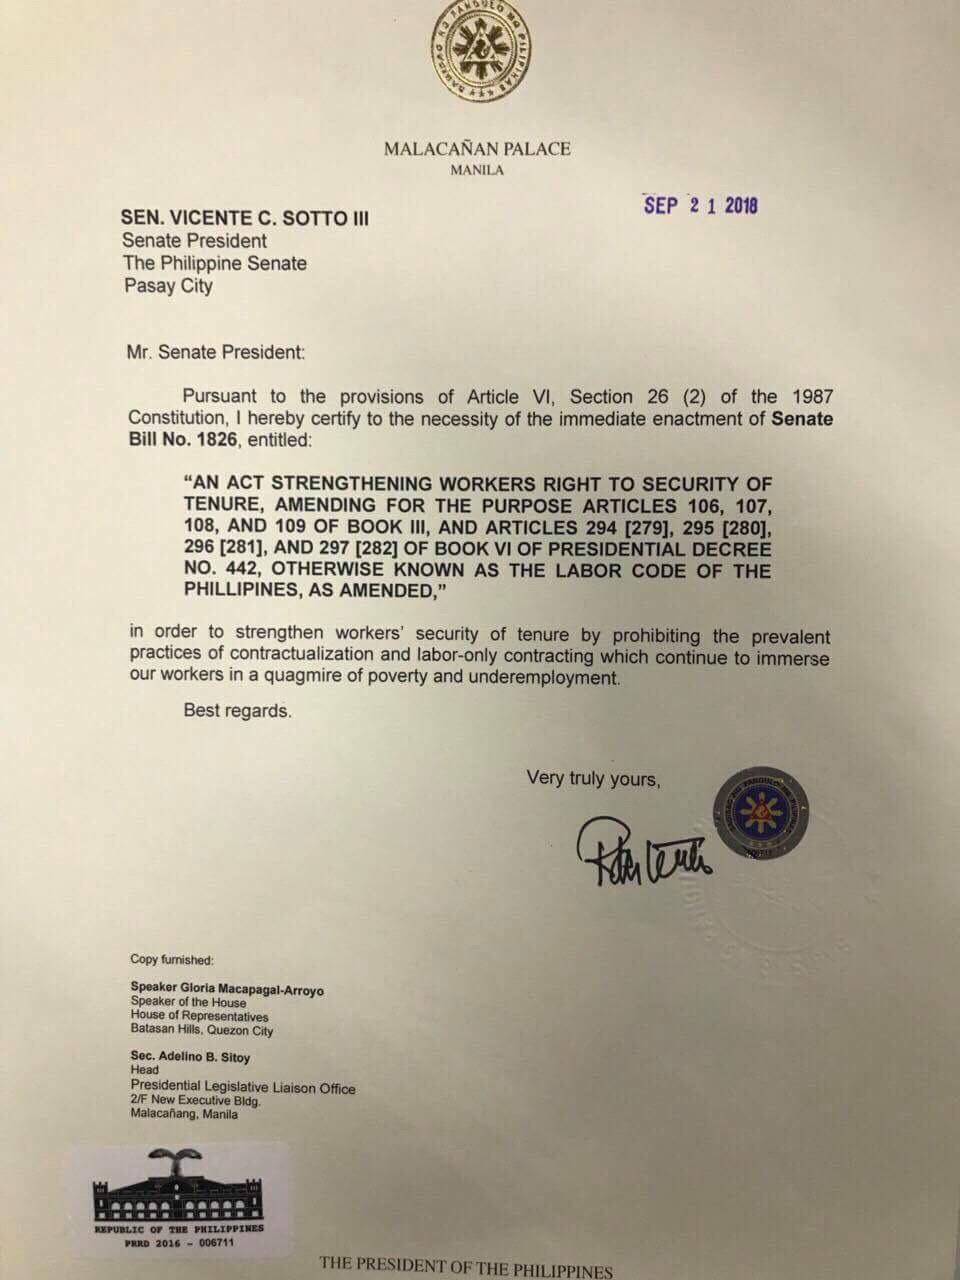 URGENT. President Rodrigo Duterte certifies Security of Tenure bill as urgent. Photo courtesy of Sentro